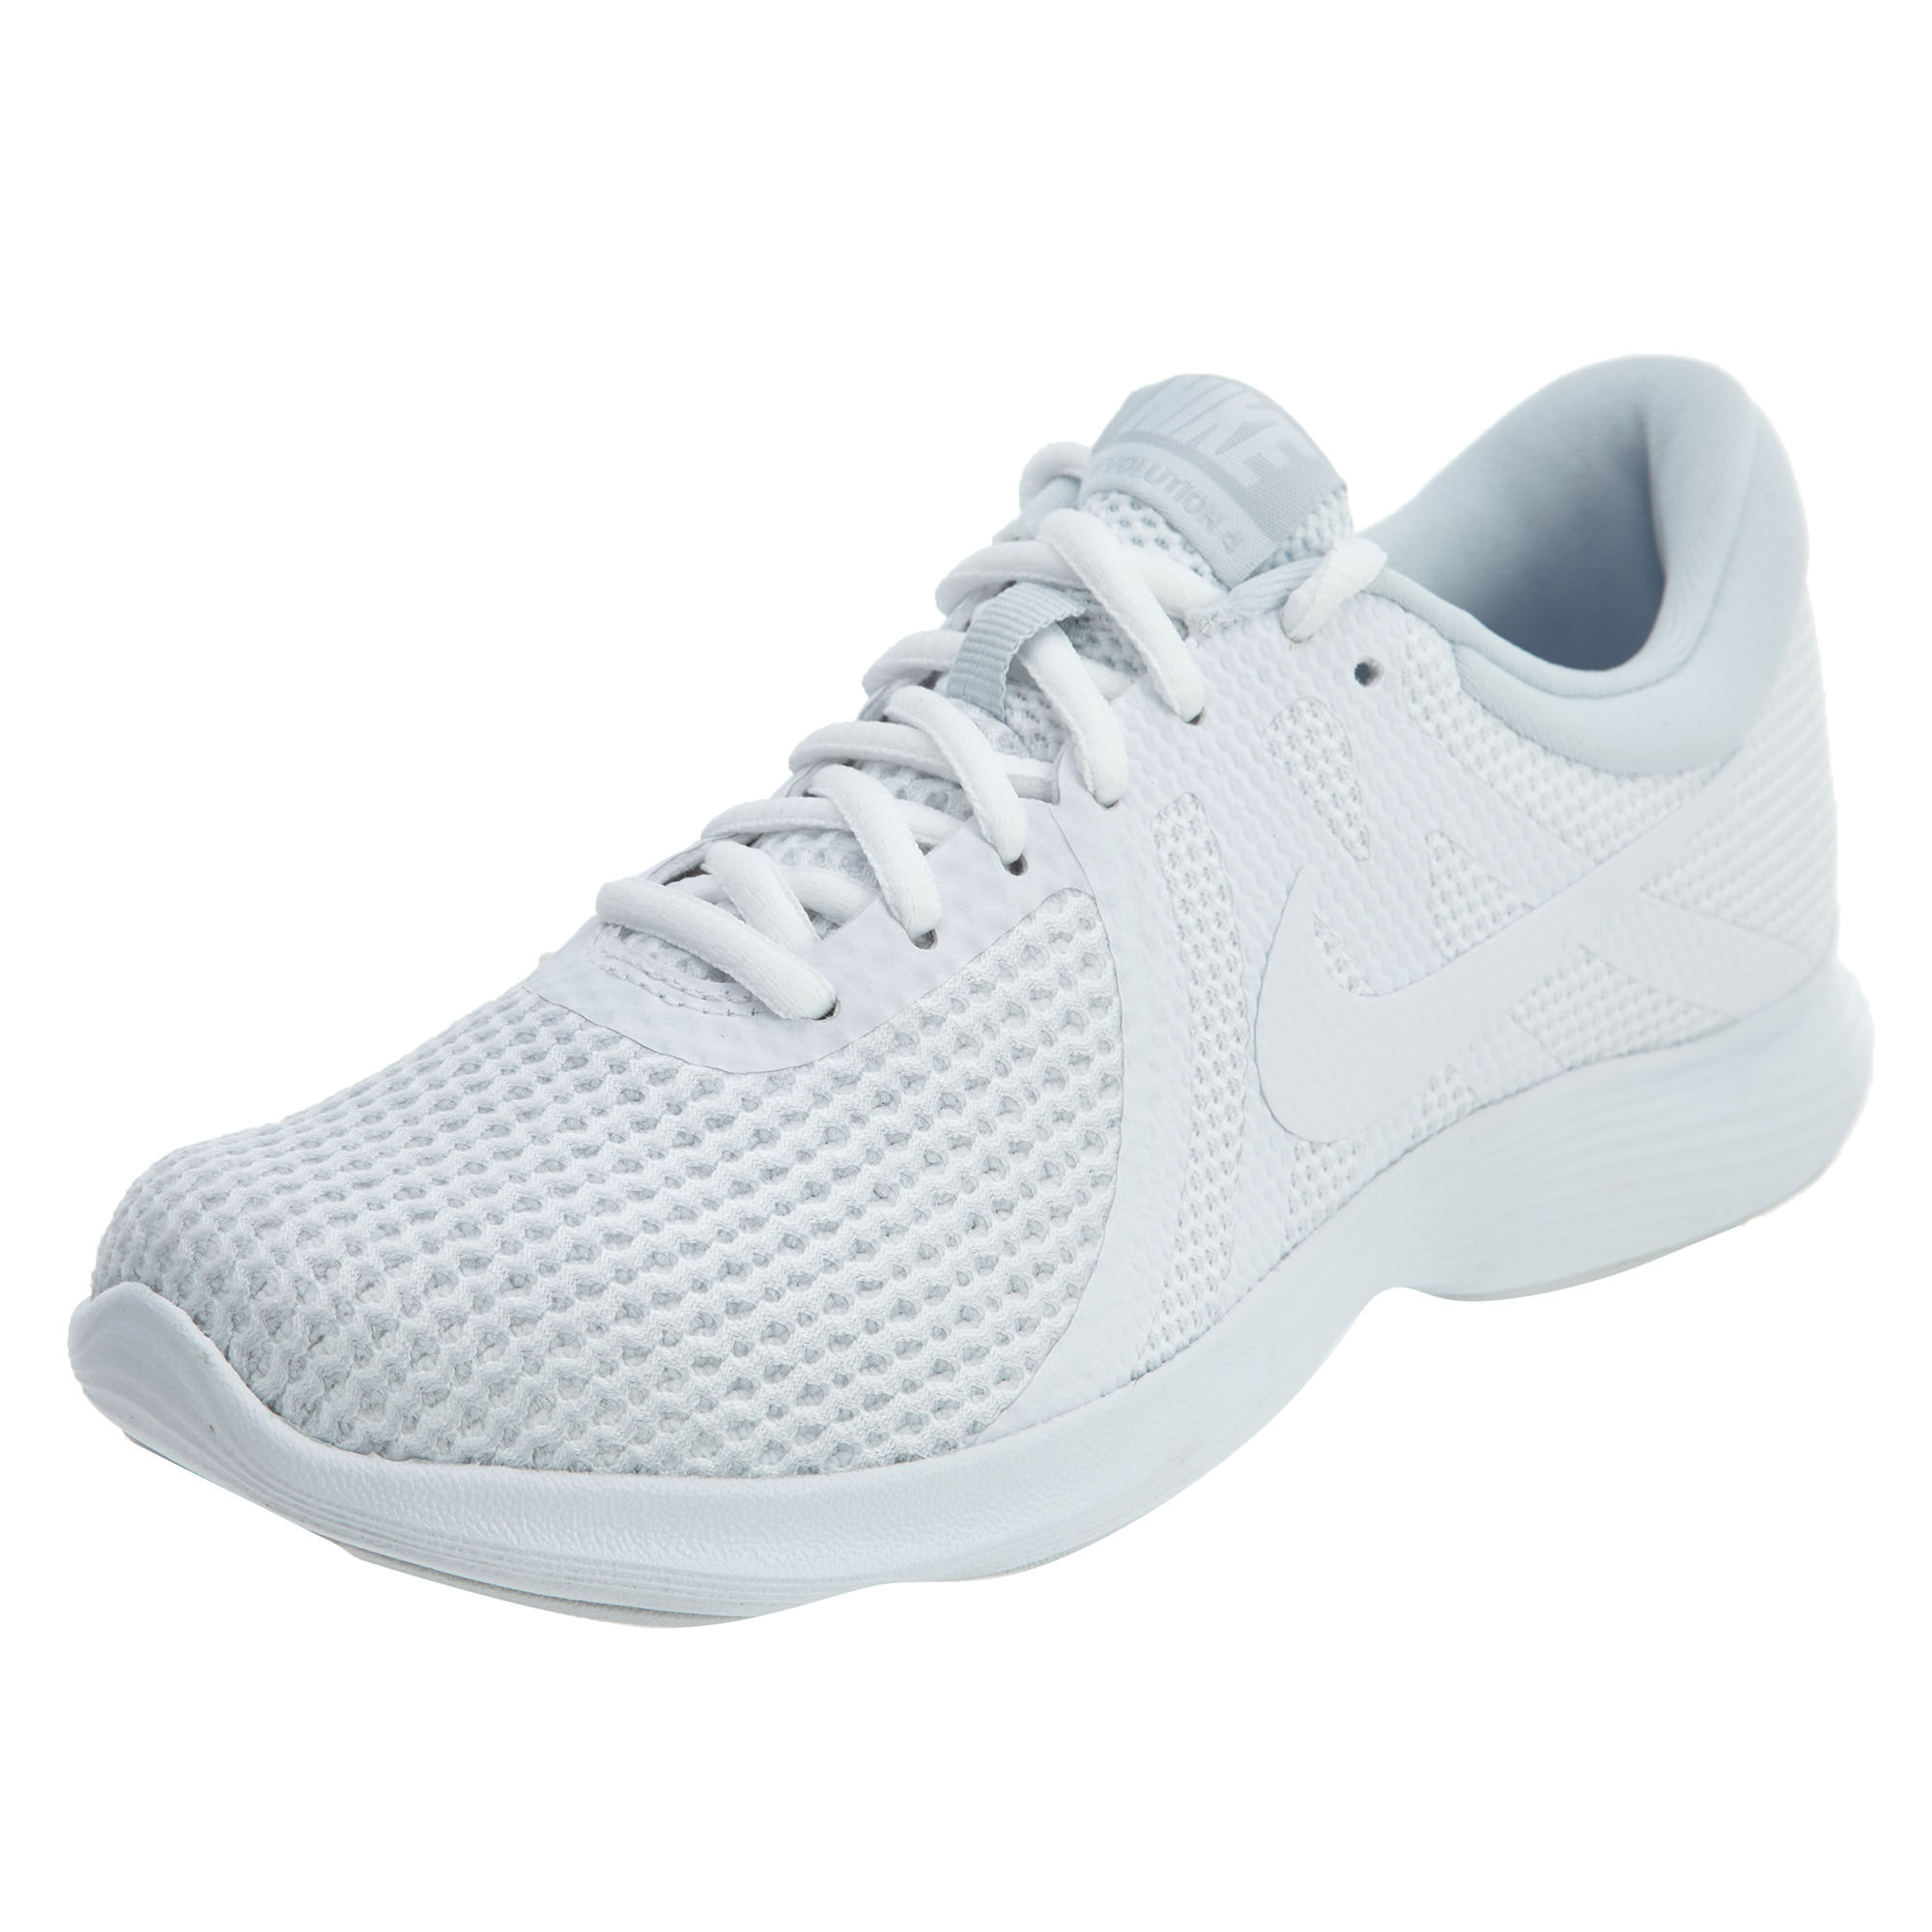 Nike Athletic REVOLUTION 4 Womens White Athletic Nike Running Shoes b0002f